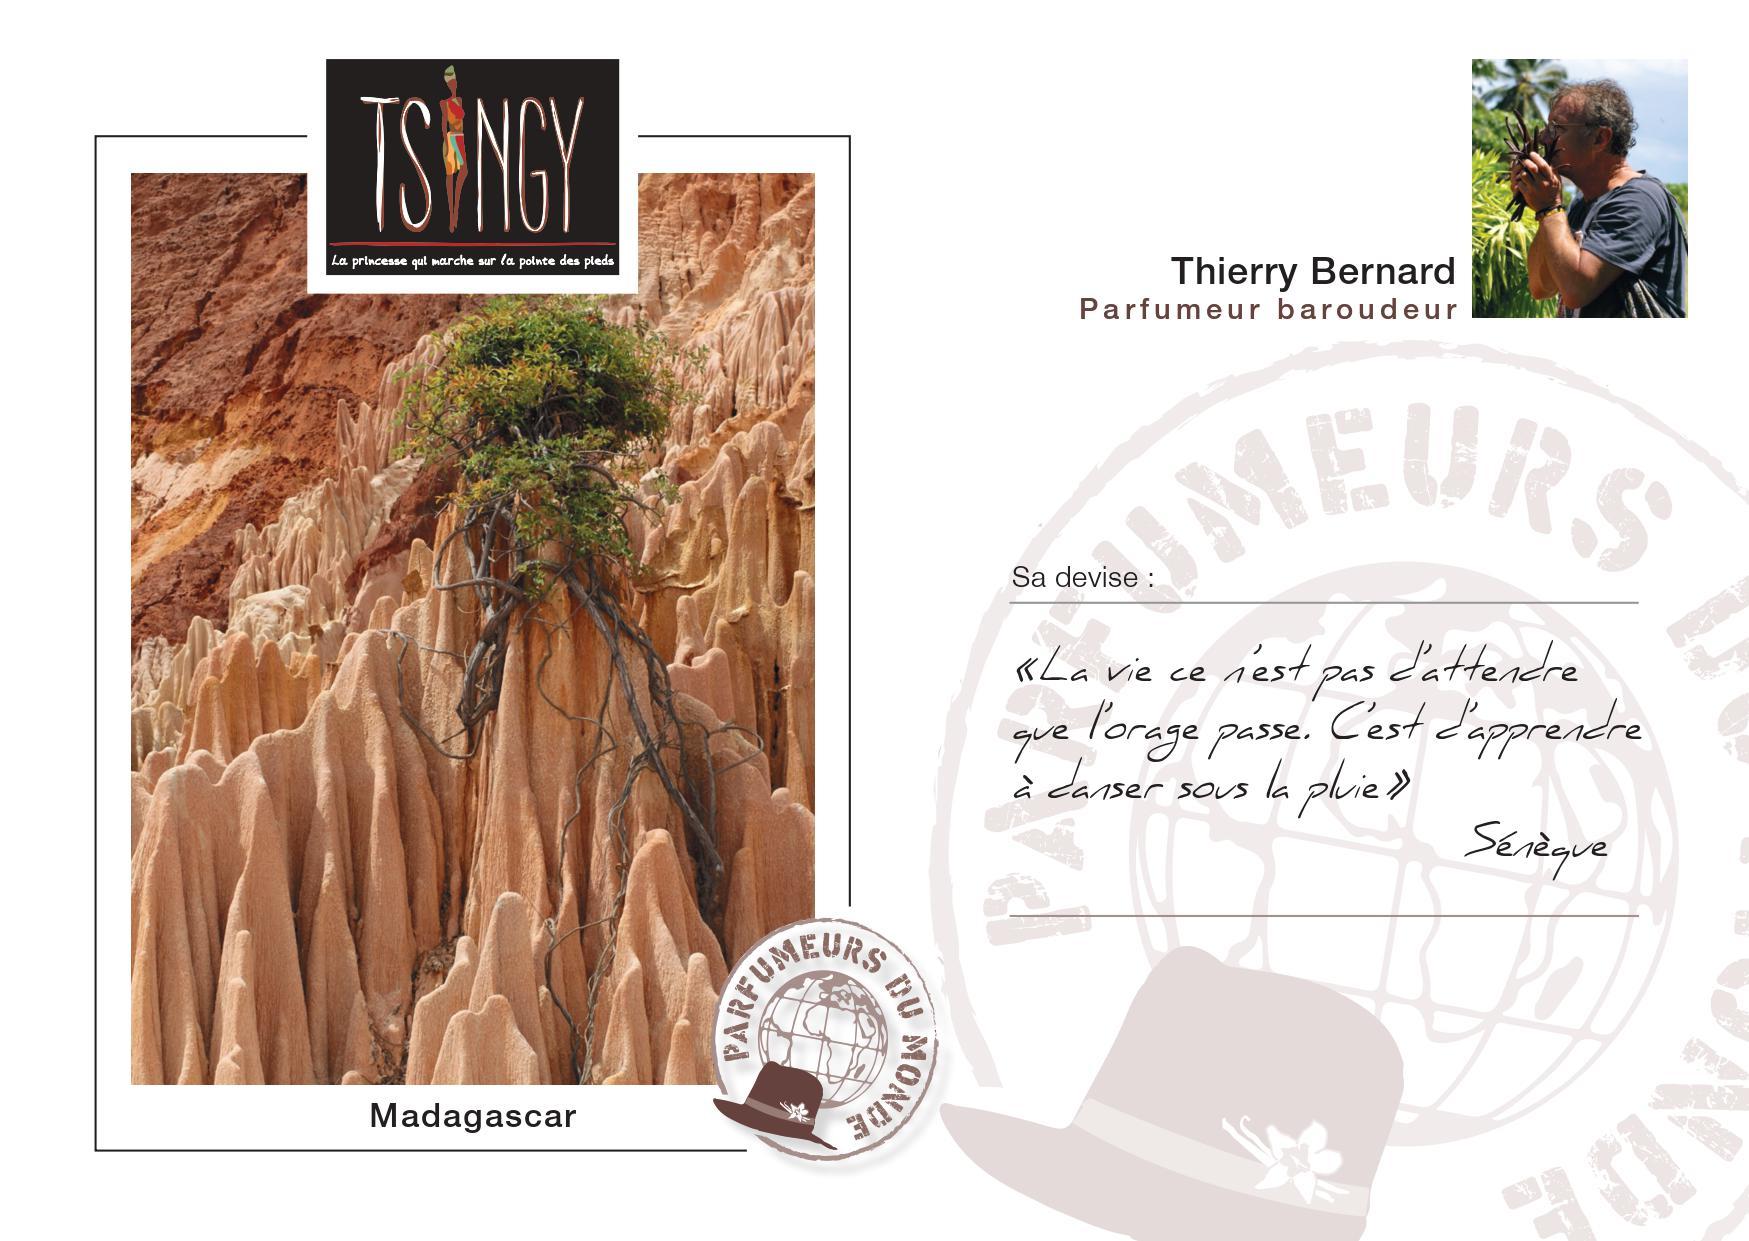 Thierry Bernard & Tsingy